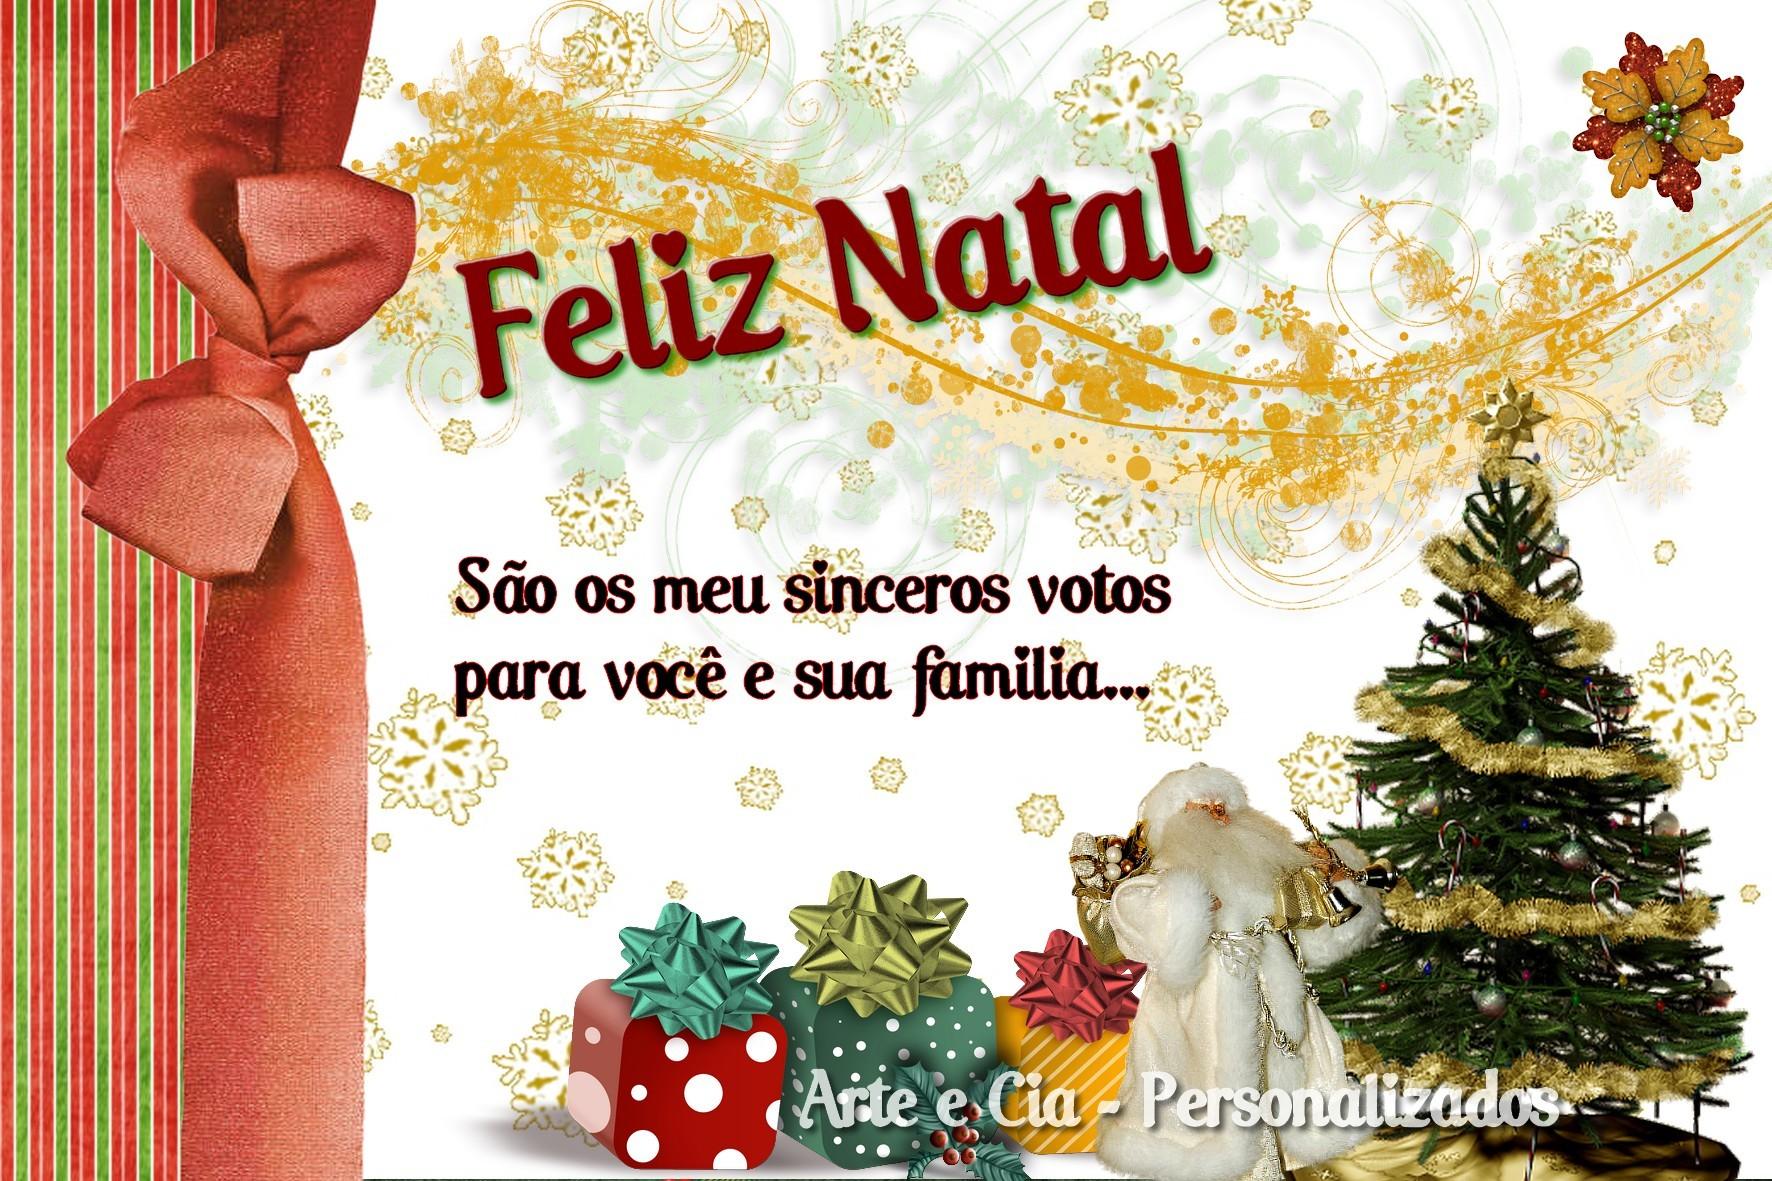 carto de natal 04 no elo7 arte e cia personalizados 368387